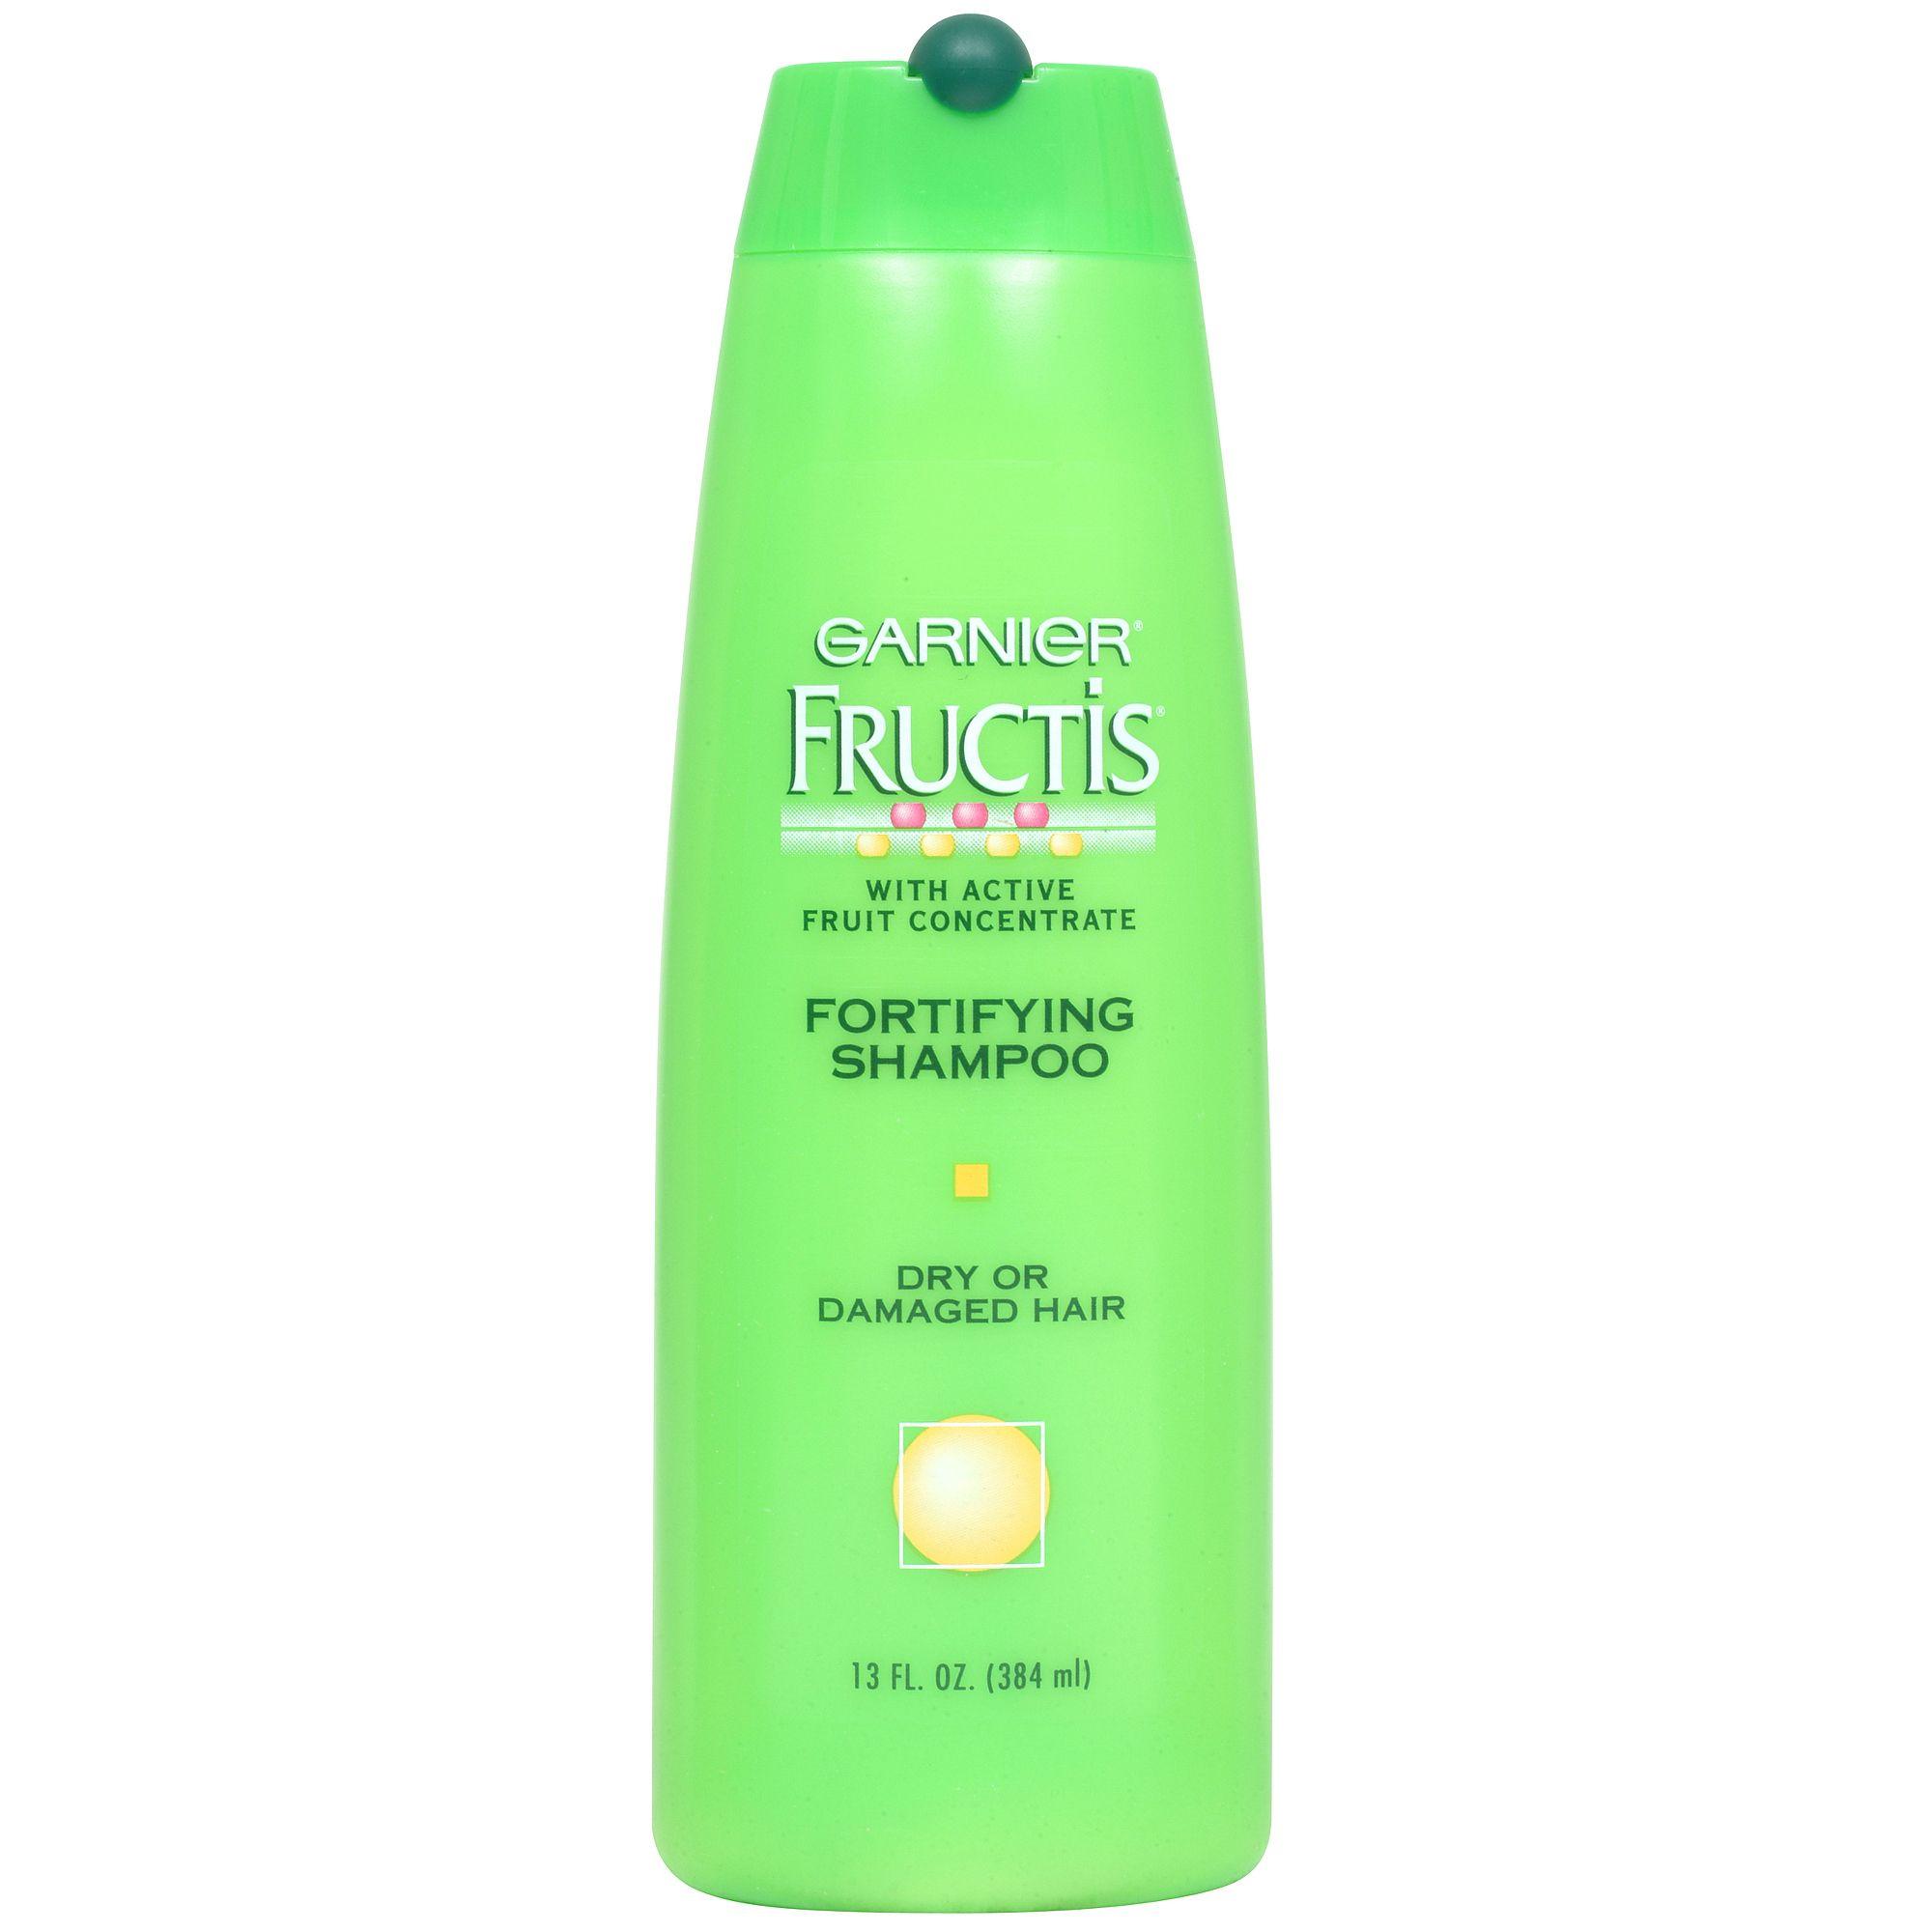 Garnier Fructis Fortifying Shampoo  For Dry or Damaged Hair